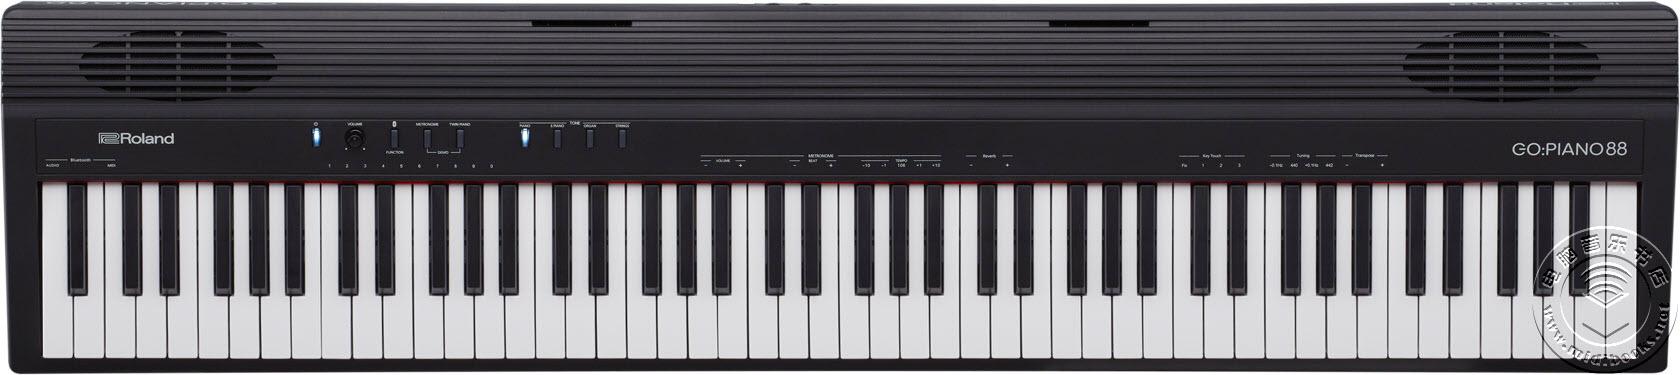 Roland发布最新88键数码钢琴GO:PIANO88,可通过蓝牙连接智能手机